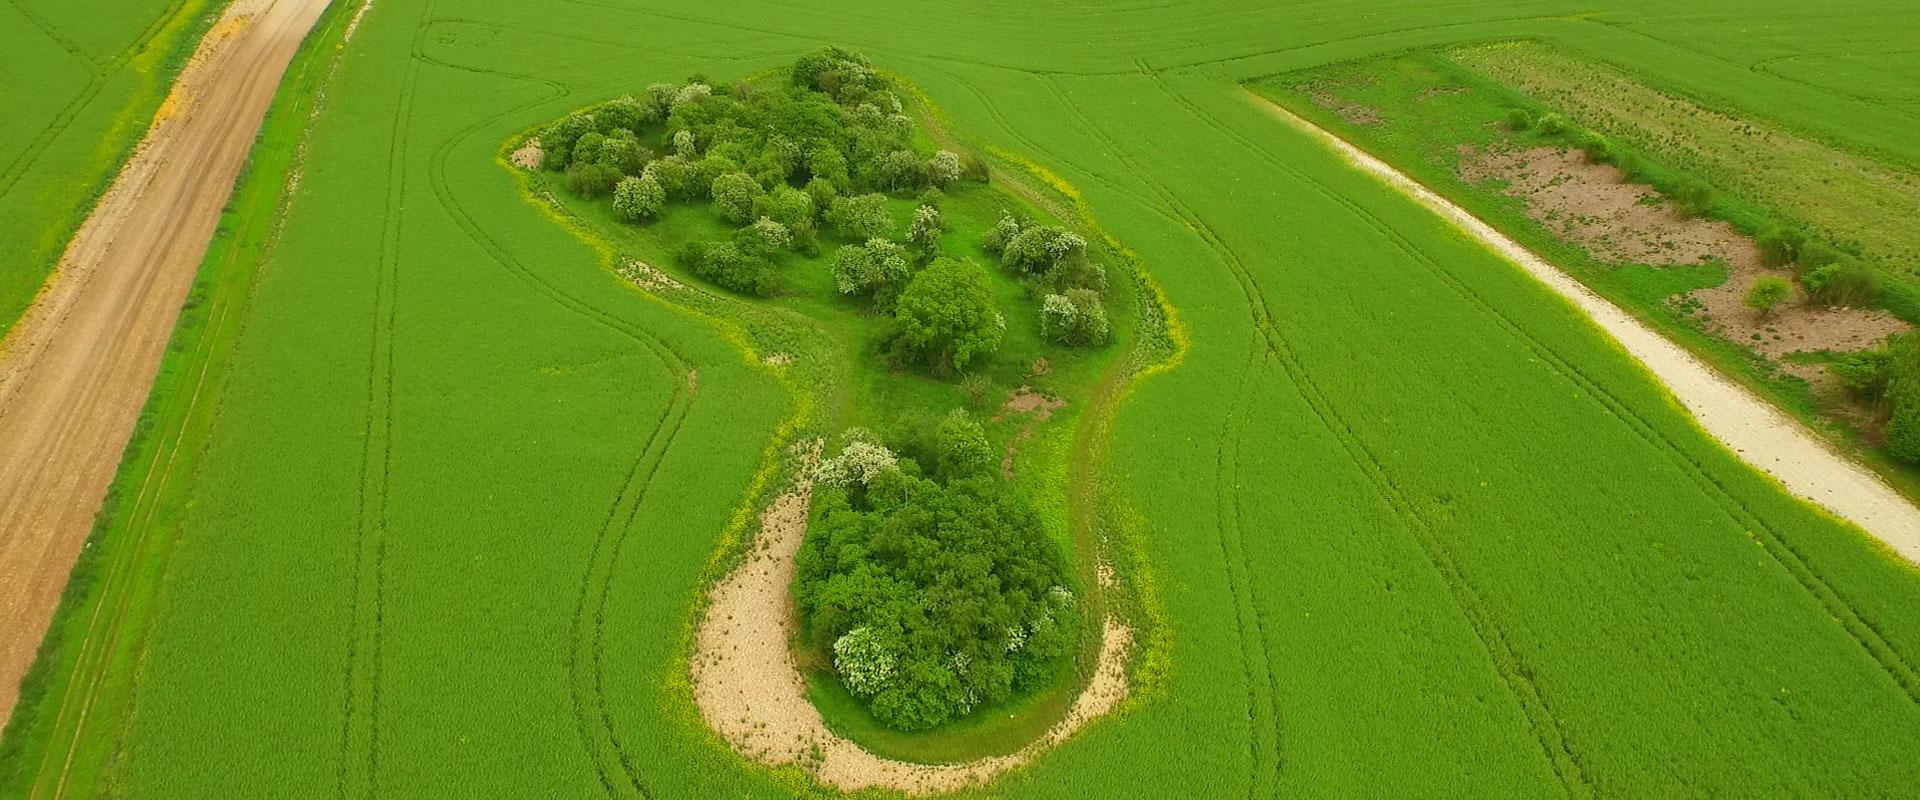 Green-footprint-5.jpg